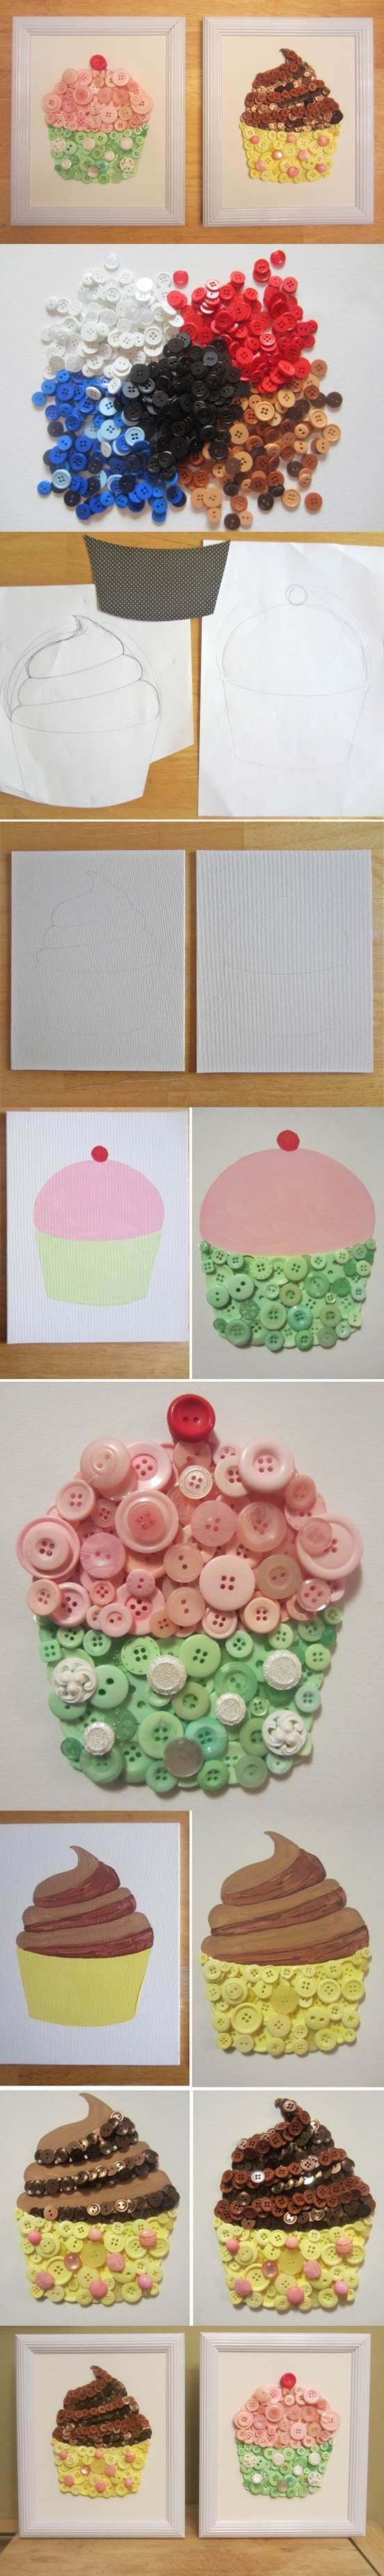 DIY Cupcake Button Crafts | iCreativeIdeas.com LIKE Us on Facebook ==> https://www.facebook.com/icreativeideas